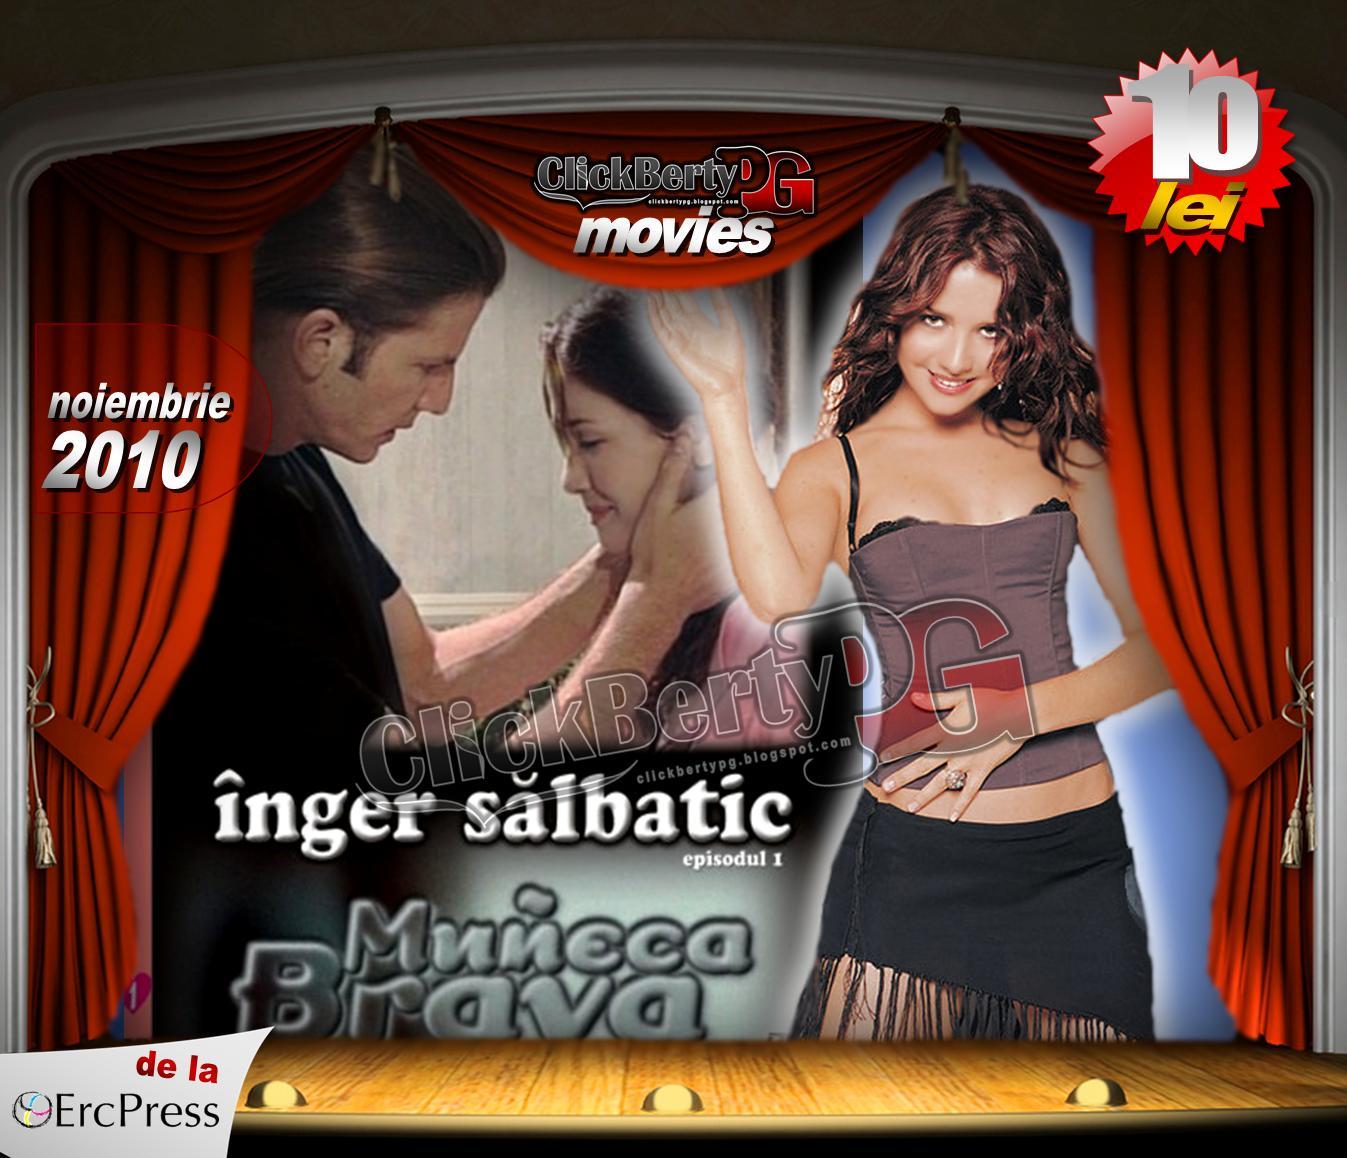 http://2.bp.blogspot.com/_E_7CxNjk9W8/TPkIY9PByXI/AAAAAAAABf4/wZTM32HRJW8/s1600/natalia_oreiro_inger_salbatic.jpg